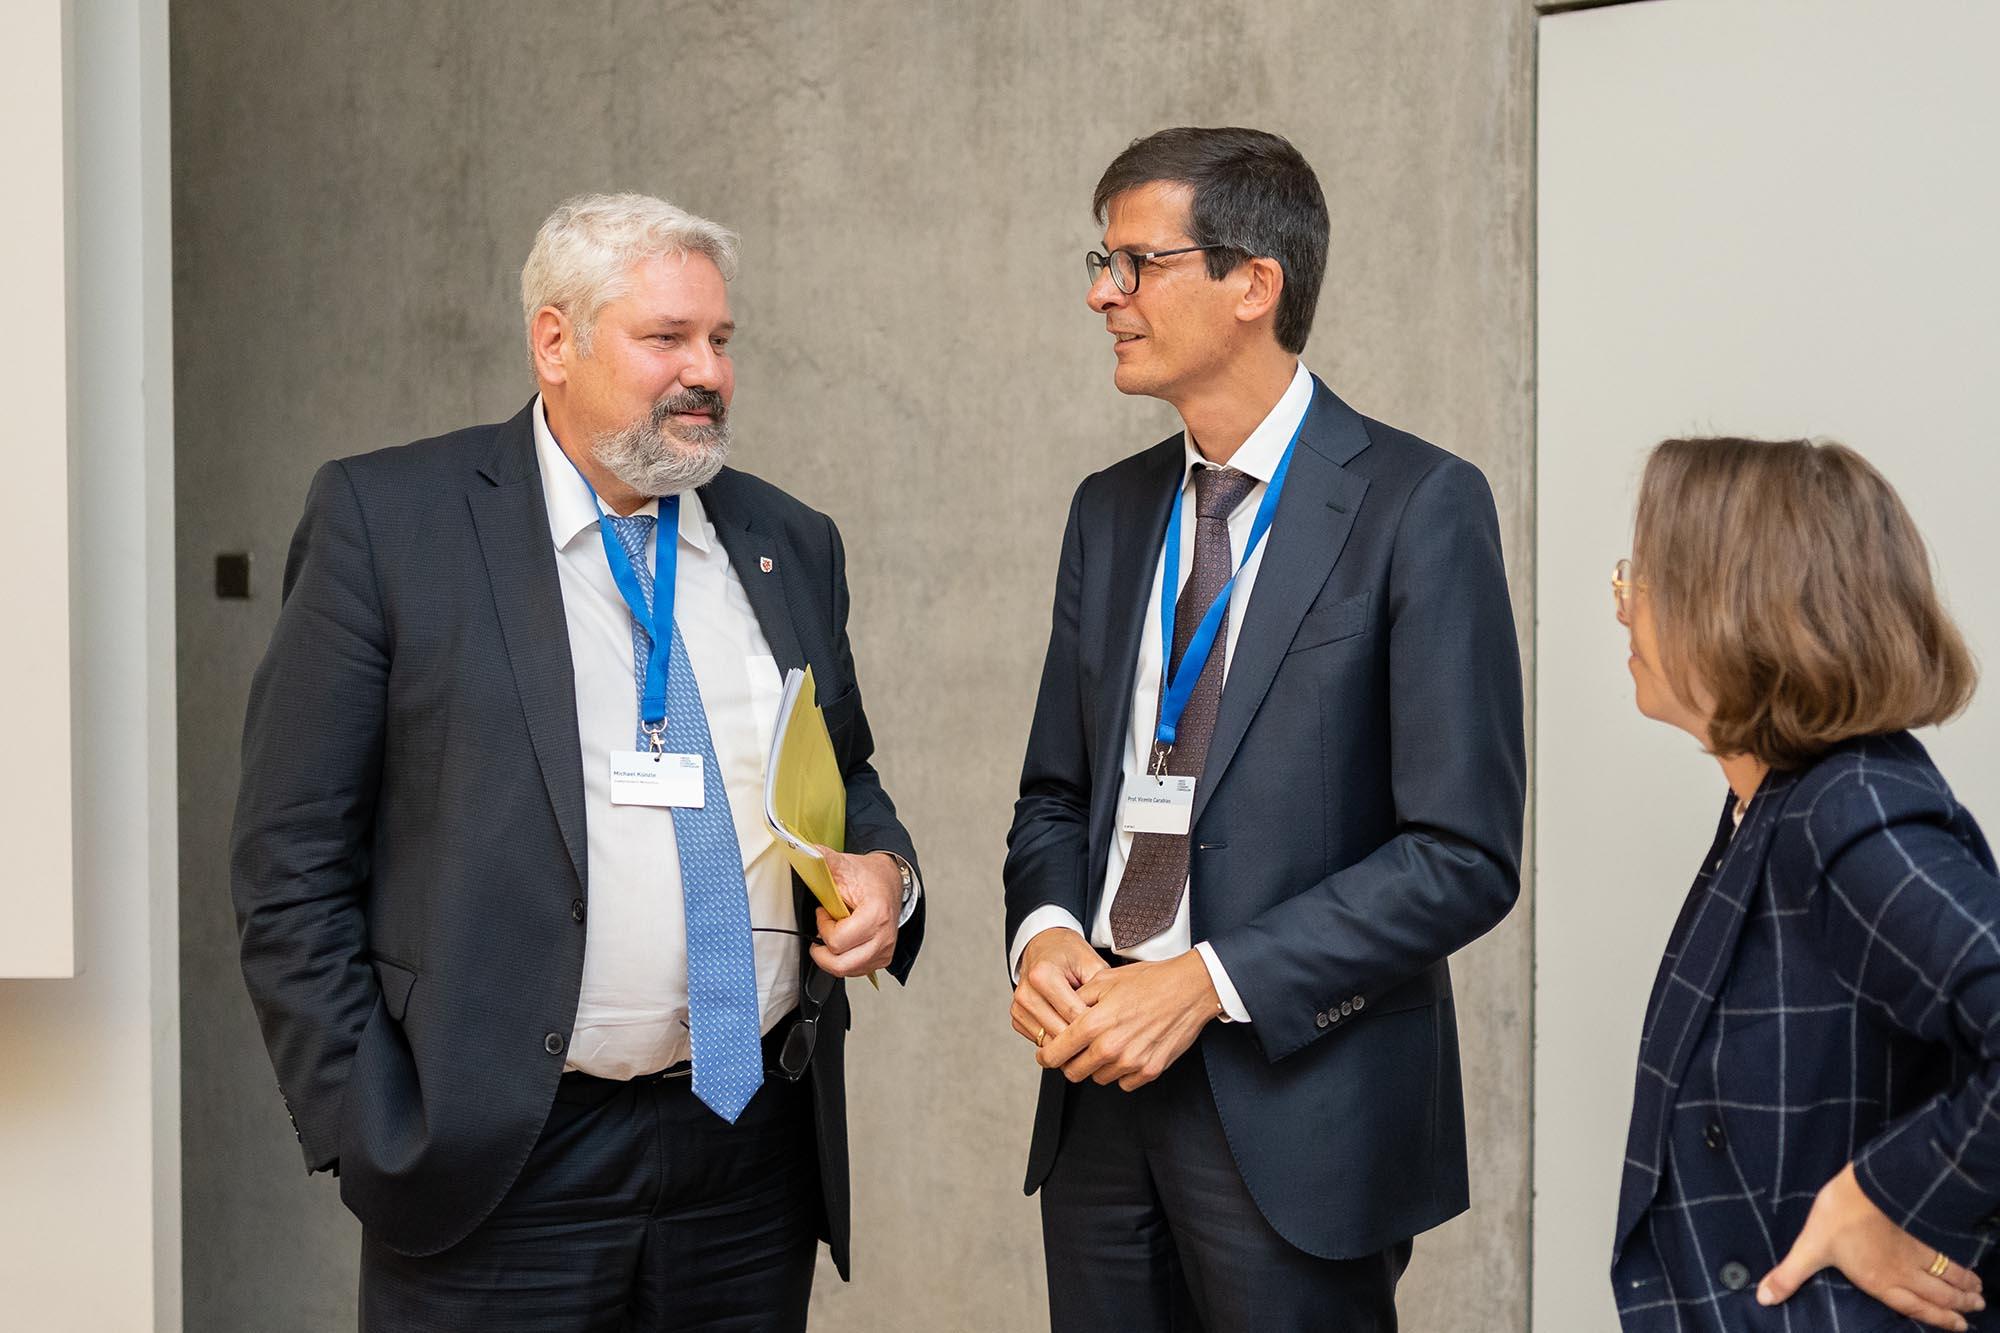 SGES Abschluss: Michael Künzle, Stadtpräsident Winterthur; Prof. Vicente Carabias, Leiter, Fachstelle Smart City Winterthur